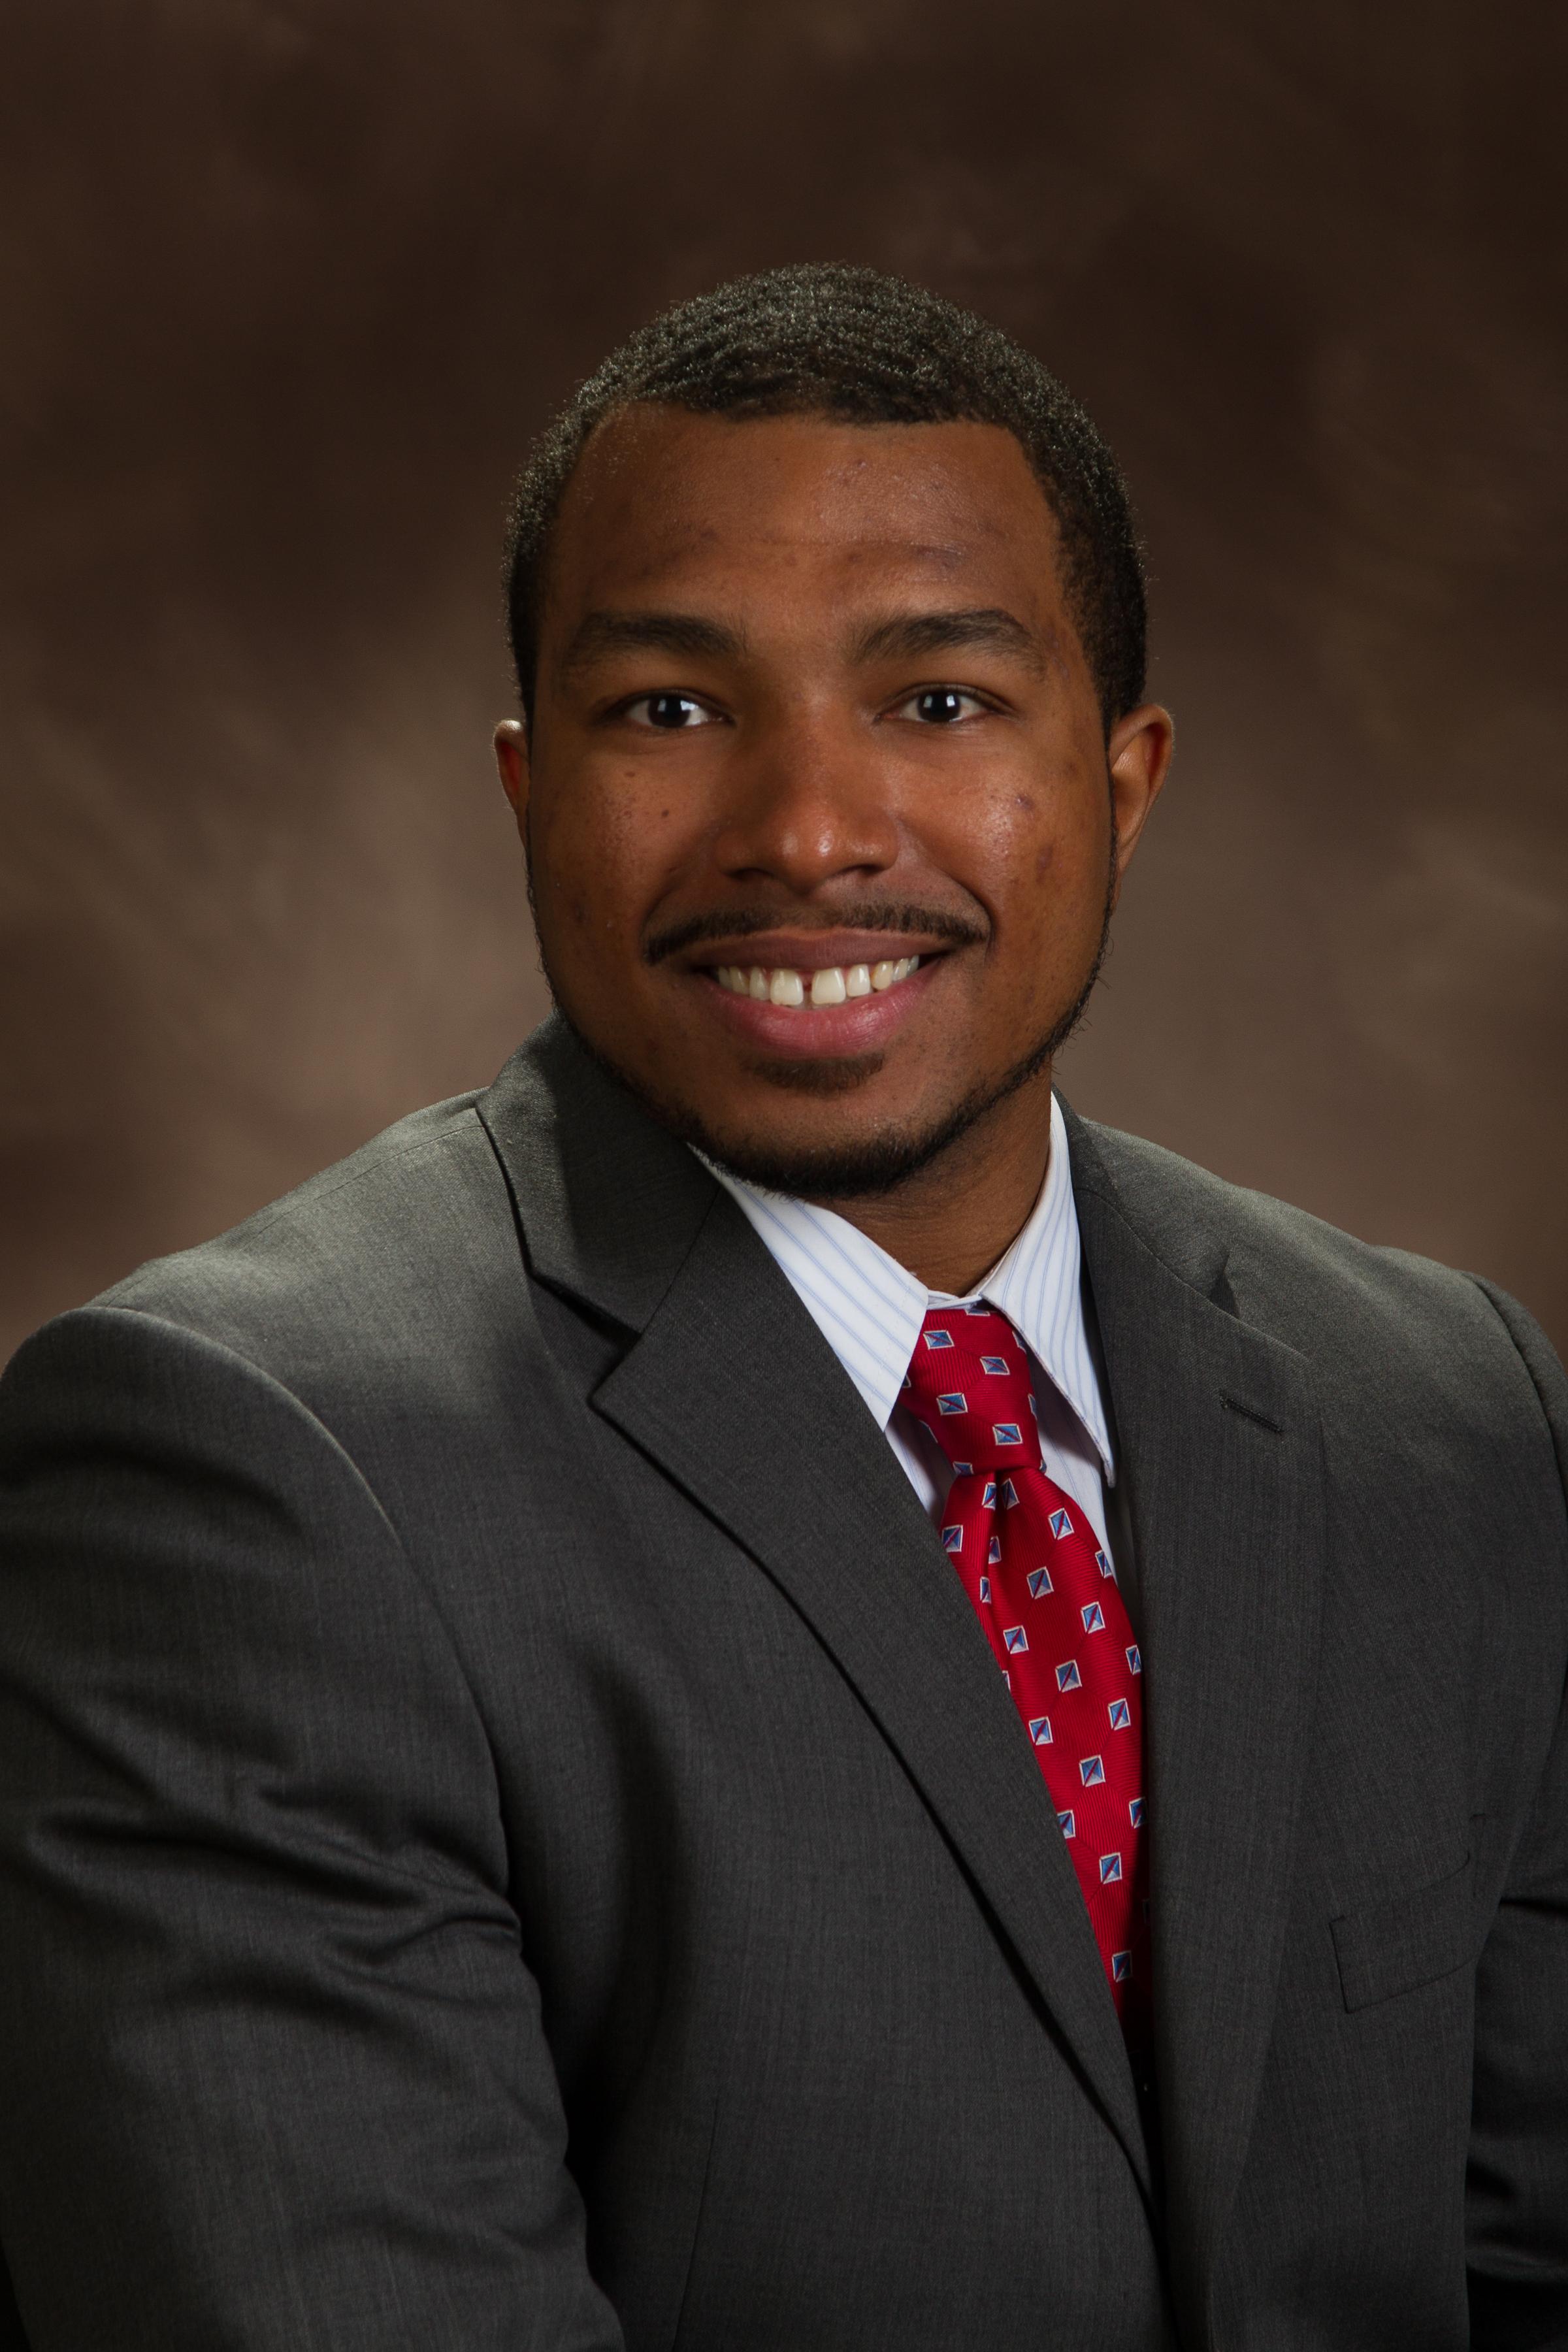 Nth Scholar William K. Roache  Howard UniversityCollege of Medicine  Preceptor Dr. Anthony Michael Harris - University of Florida Shands  Jacksonville, FL